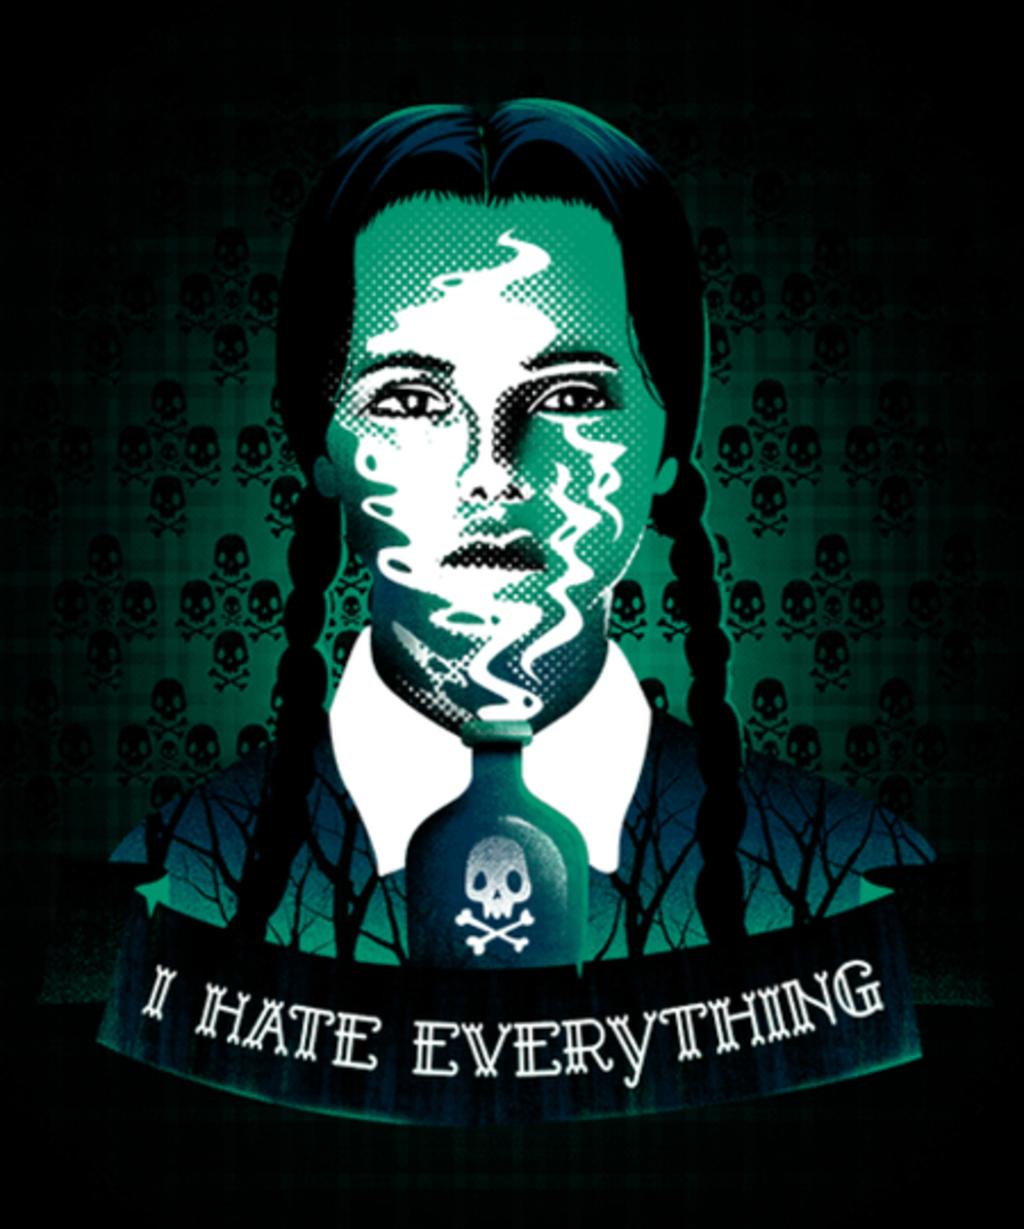 Qwertee: I hate everything